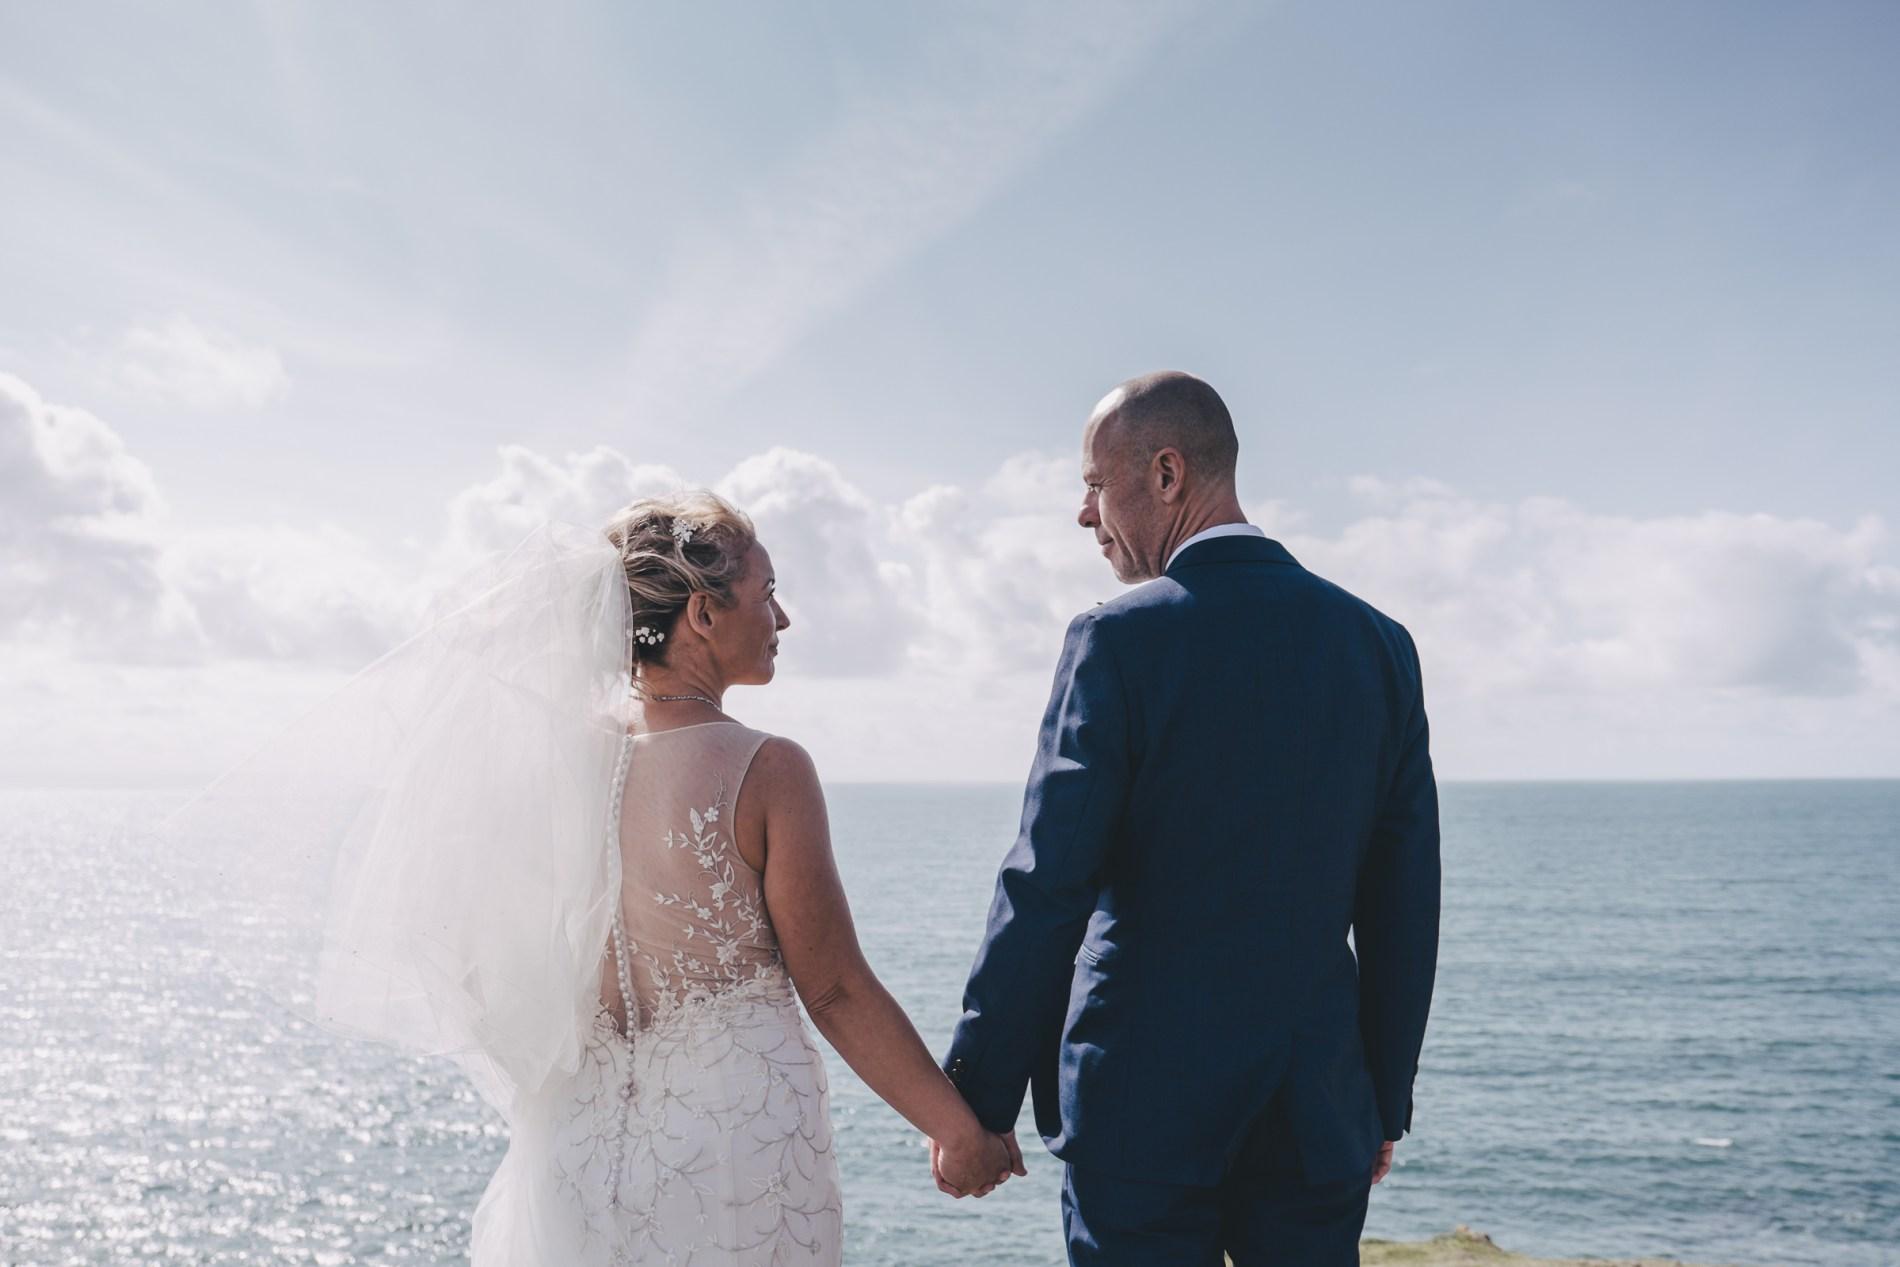 langland-bay-swansea-wedding-sian-rob-medium-print-274